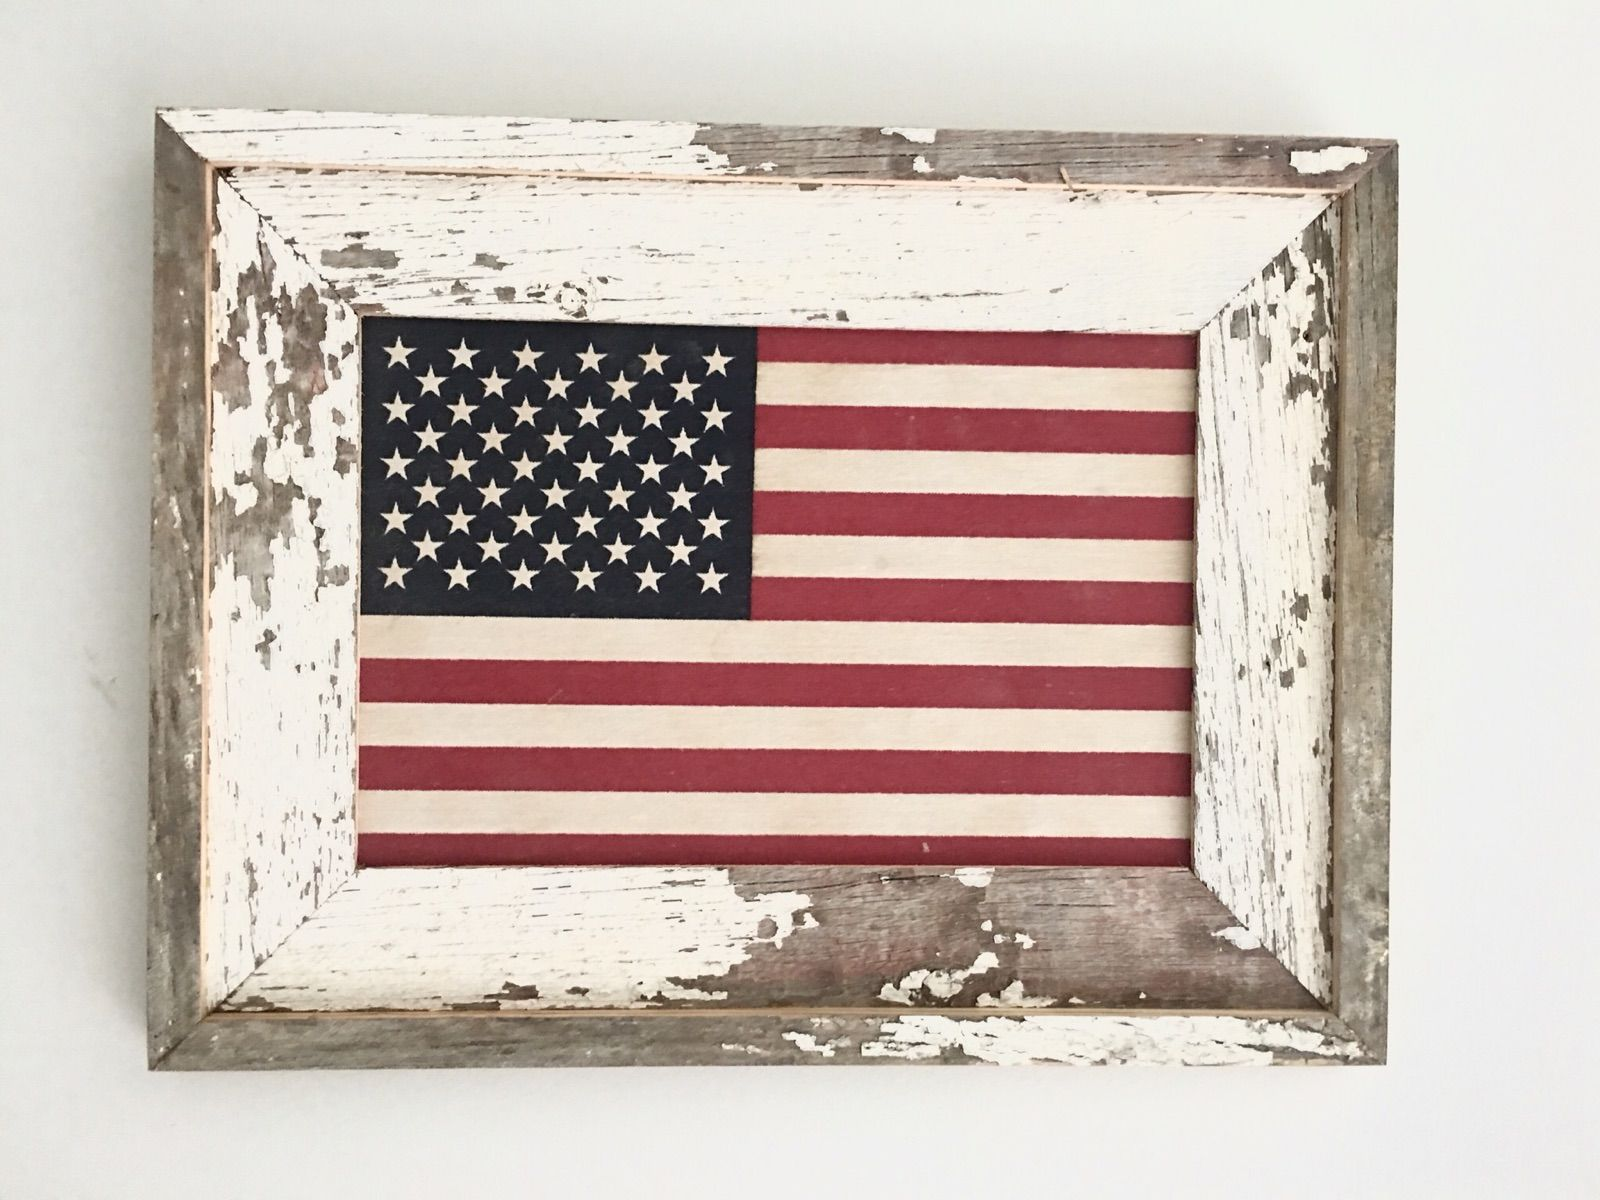 17x22 Framed American flag Century old reclaimed barn wood framing a ...